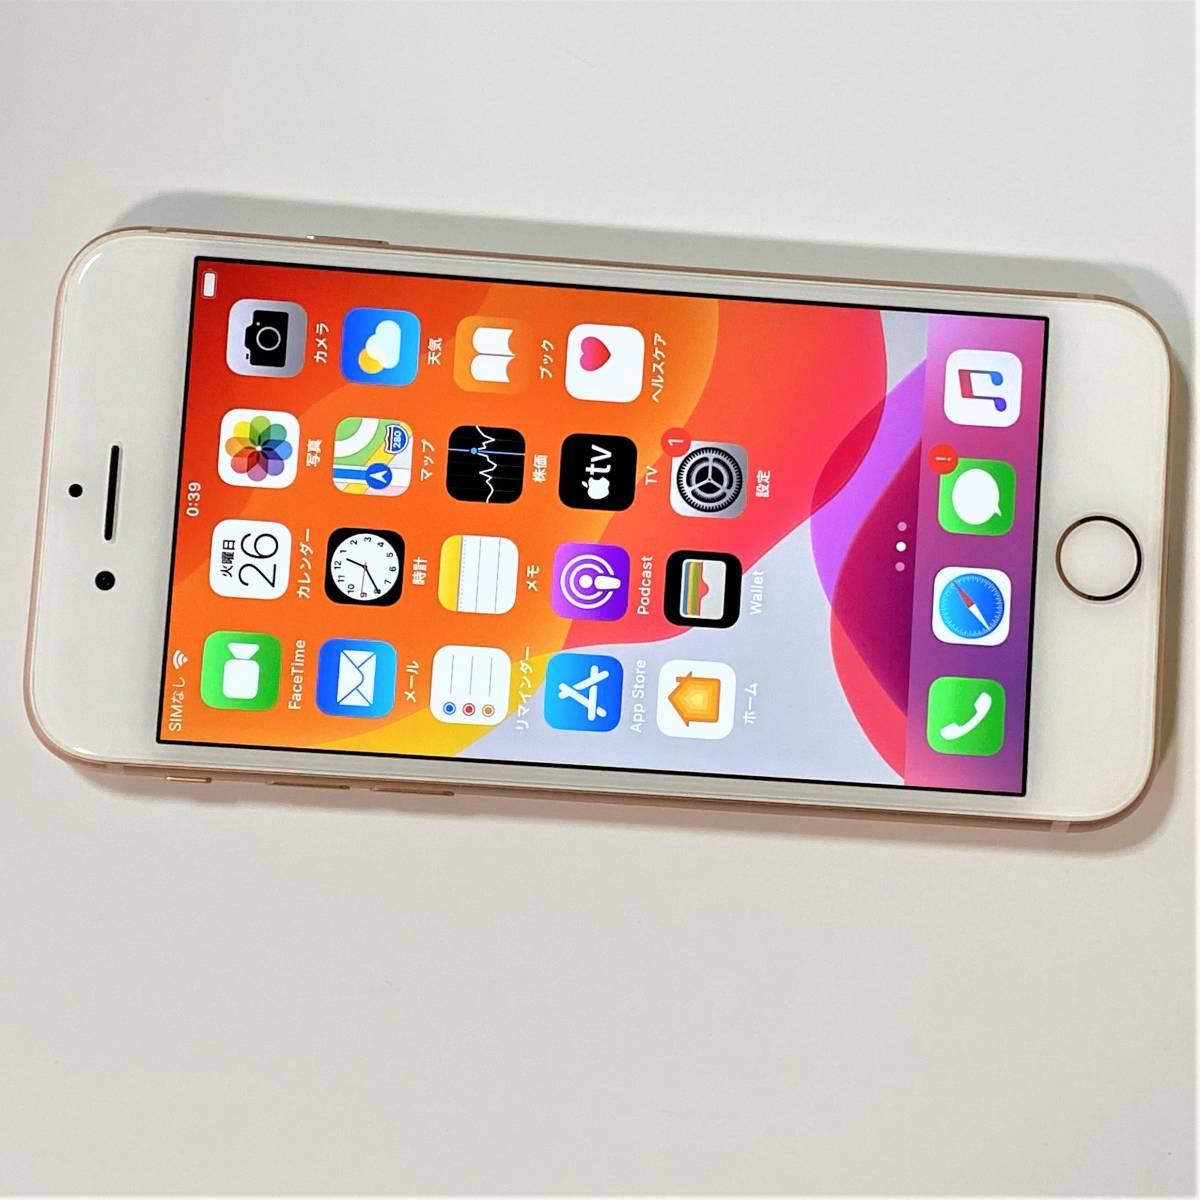 (美品) SIMフリー iPhone 8 ゴールド 64GB MQ7A2J/A バッテリー最大容量92% docomo 格安SIM MVNO 海外可 アクティベーションロック解除済